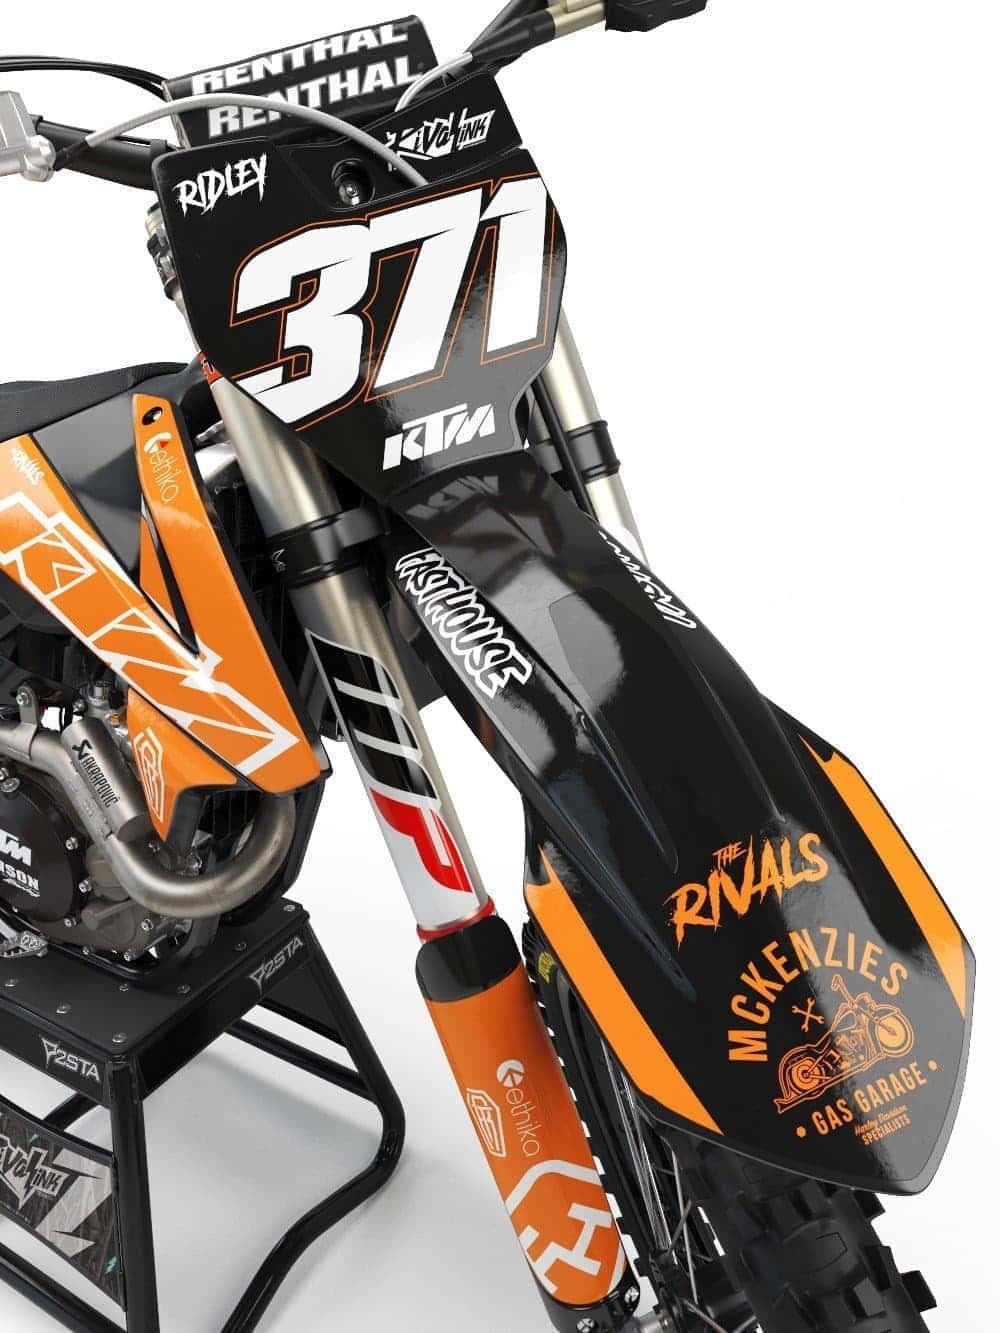 KTM BACKSTREET KIT Rival Ink Design Co